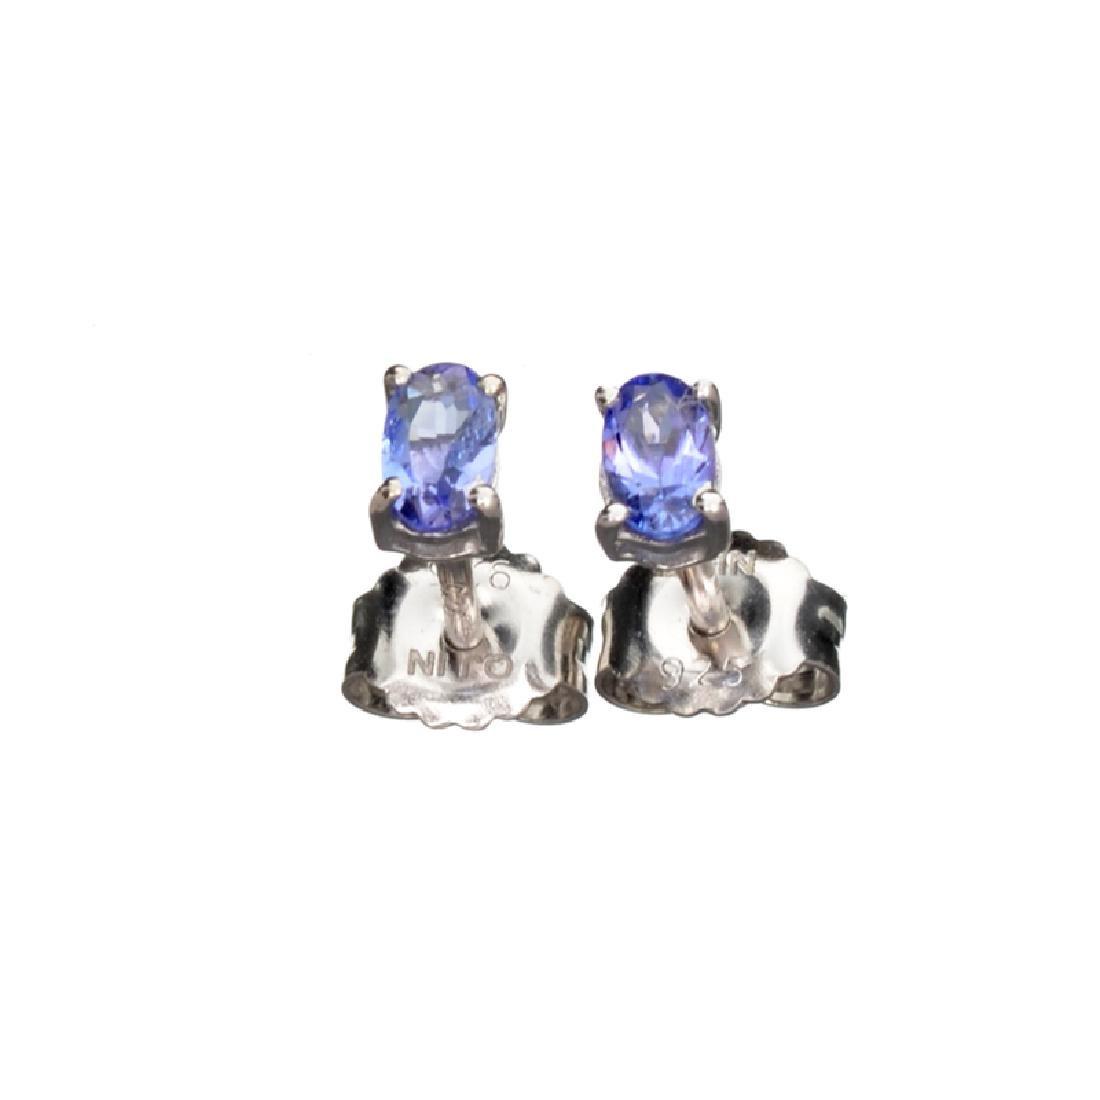 APP: 0.5k Fine Jewelry 0.50CT Oval Cut Tanzanite And